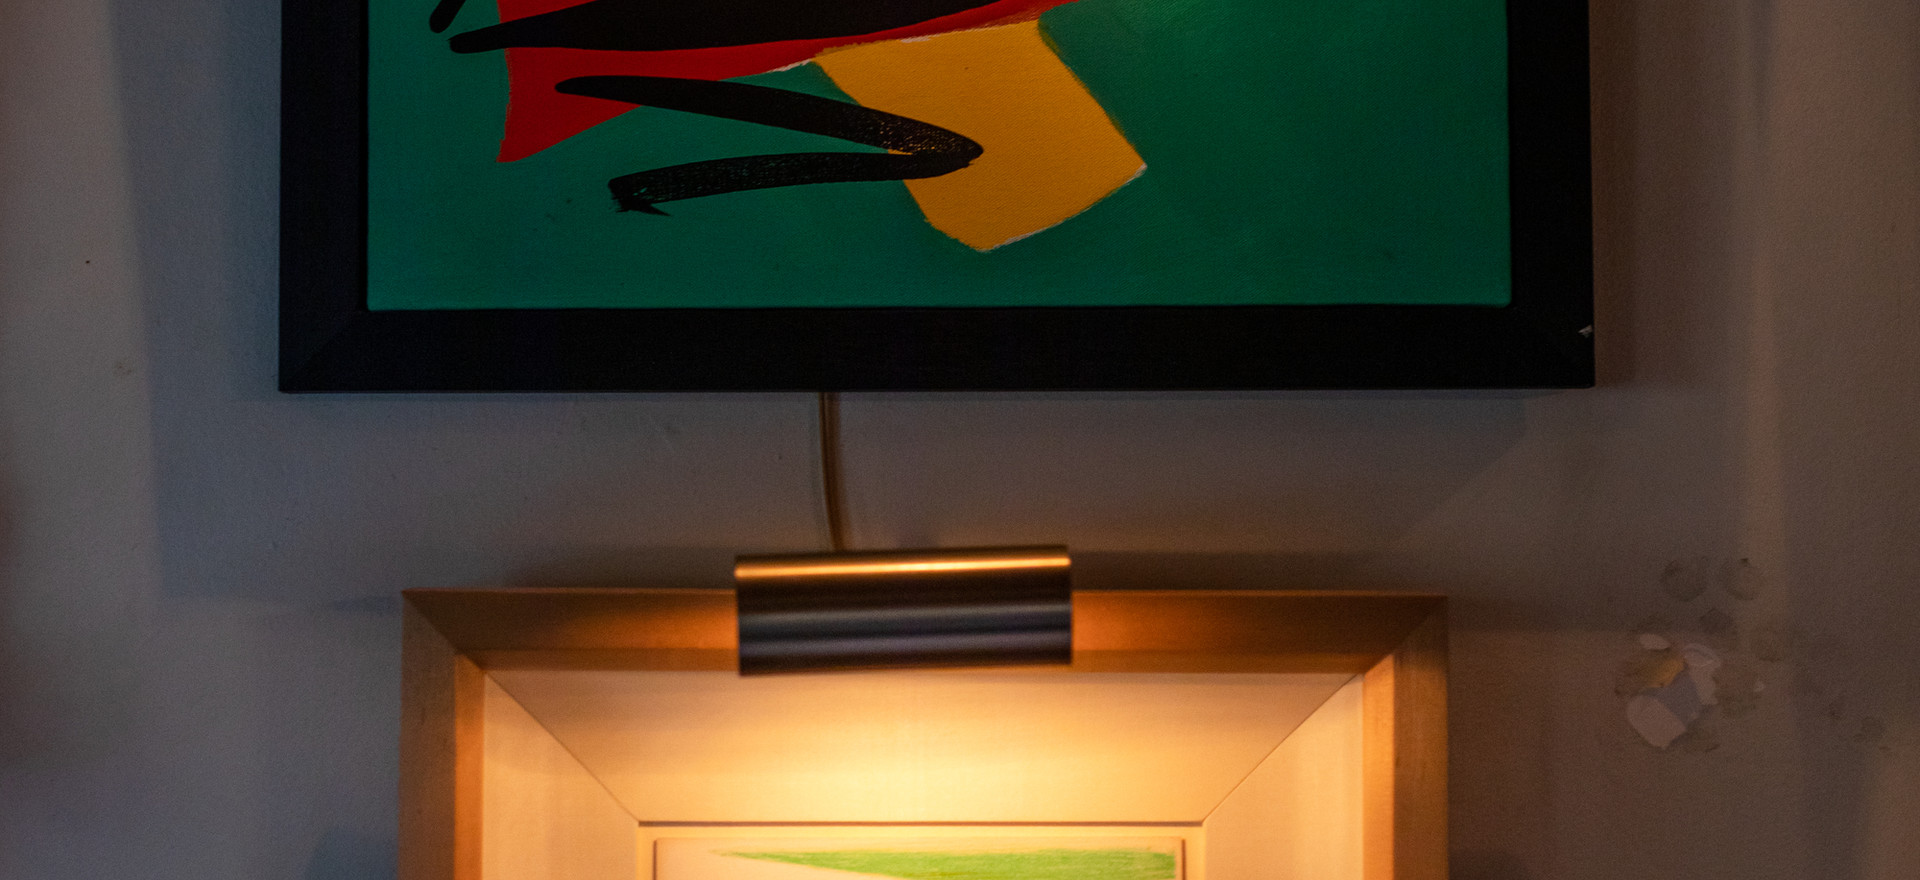 Tom Slaughter (above) David Hockney (below)